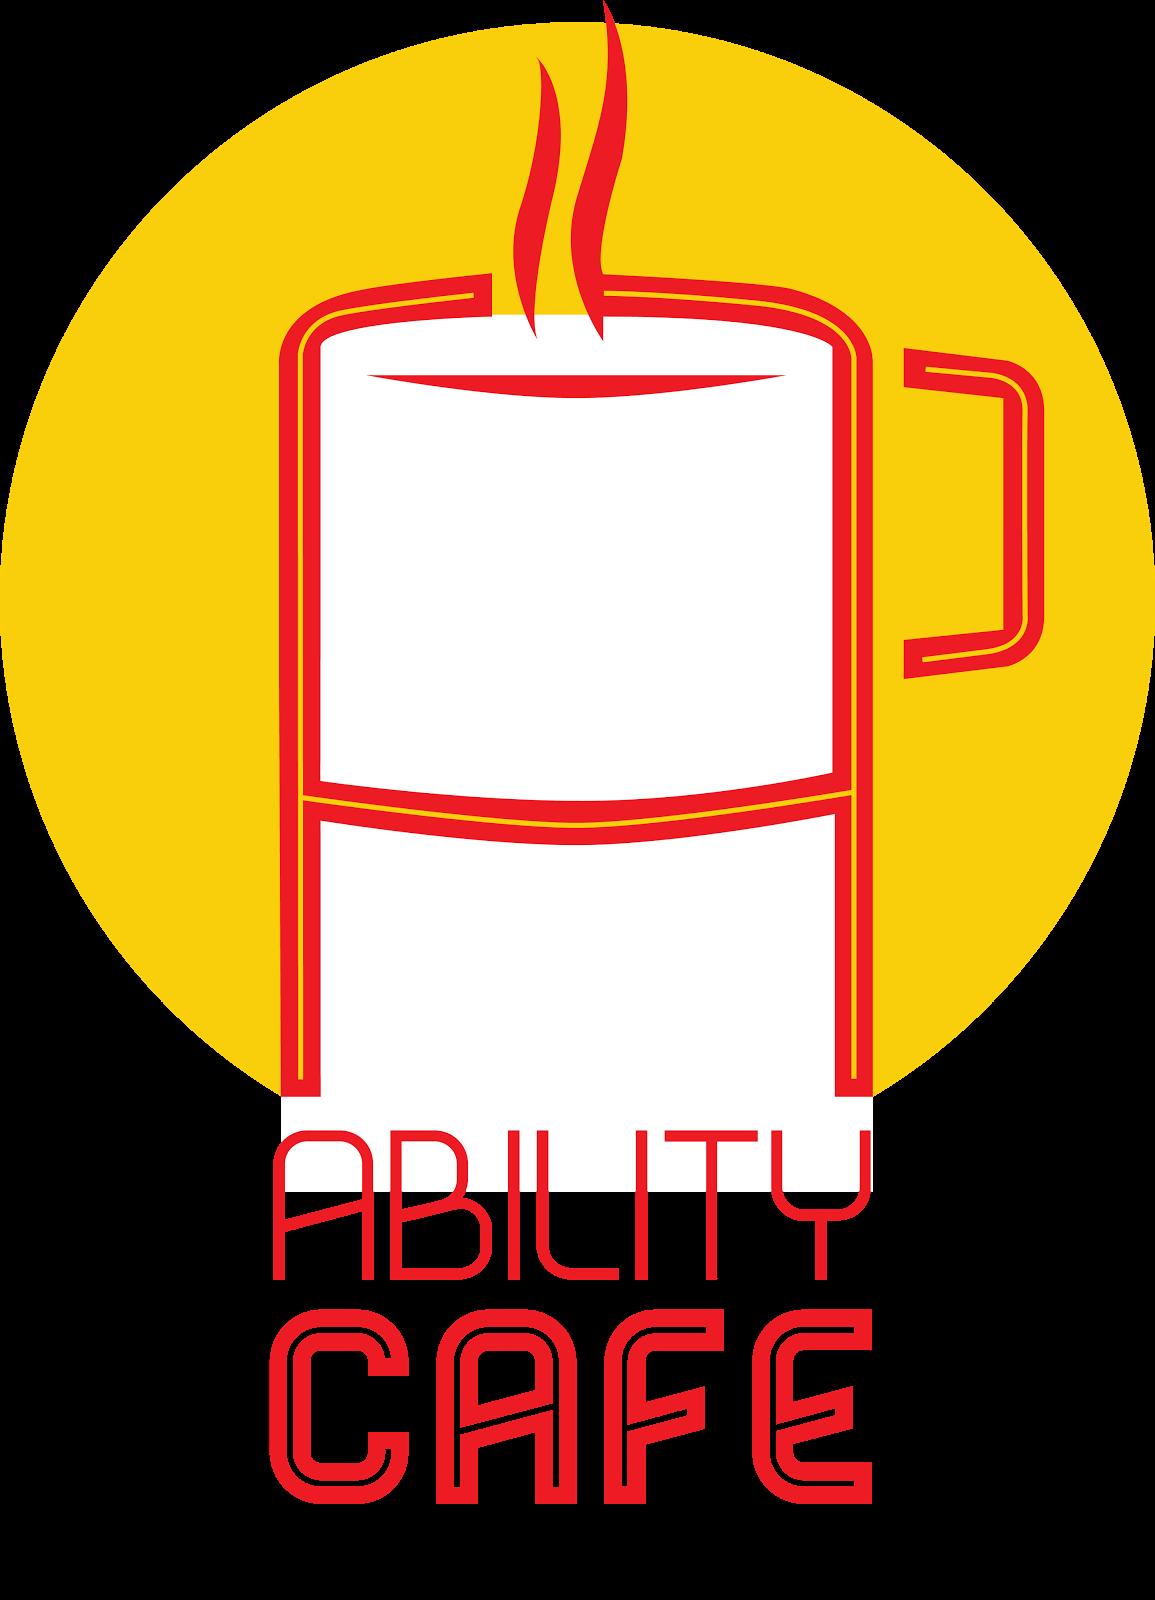 Ability Cafe